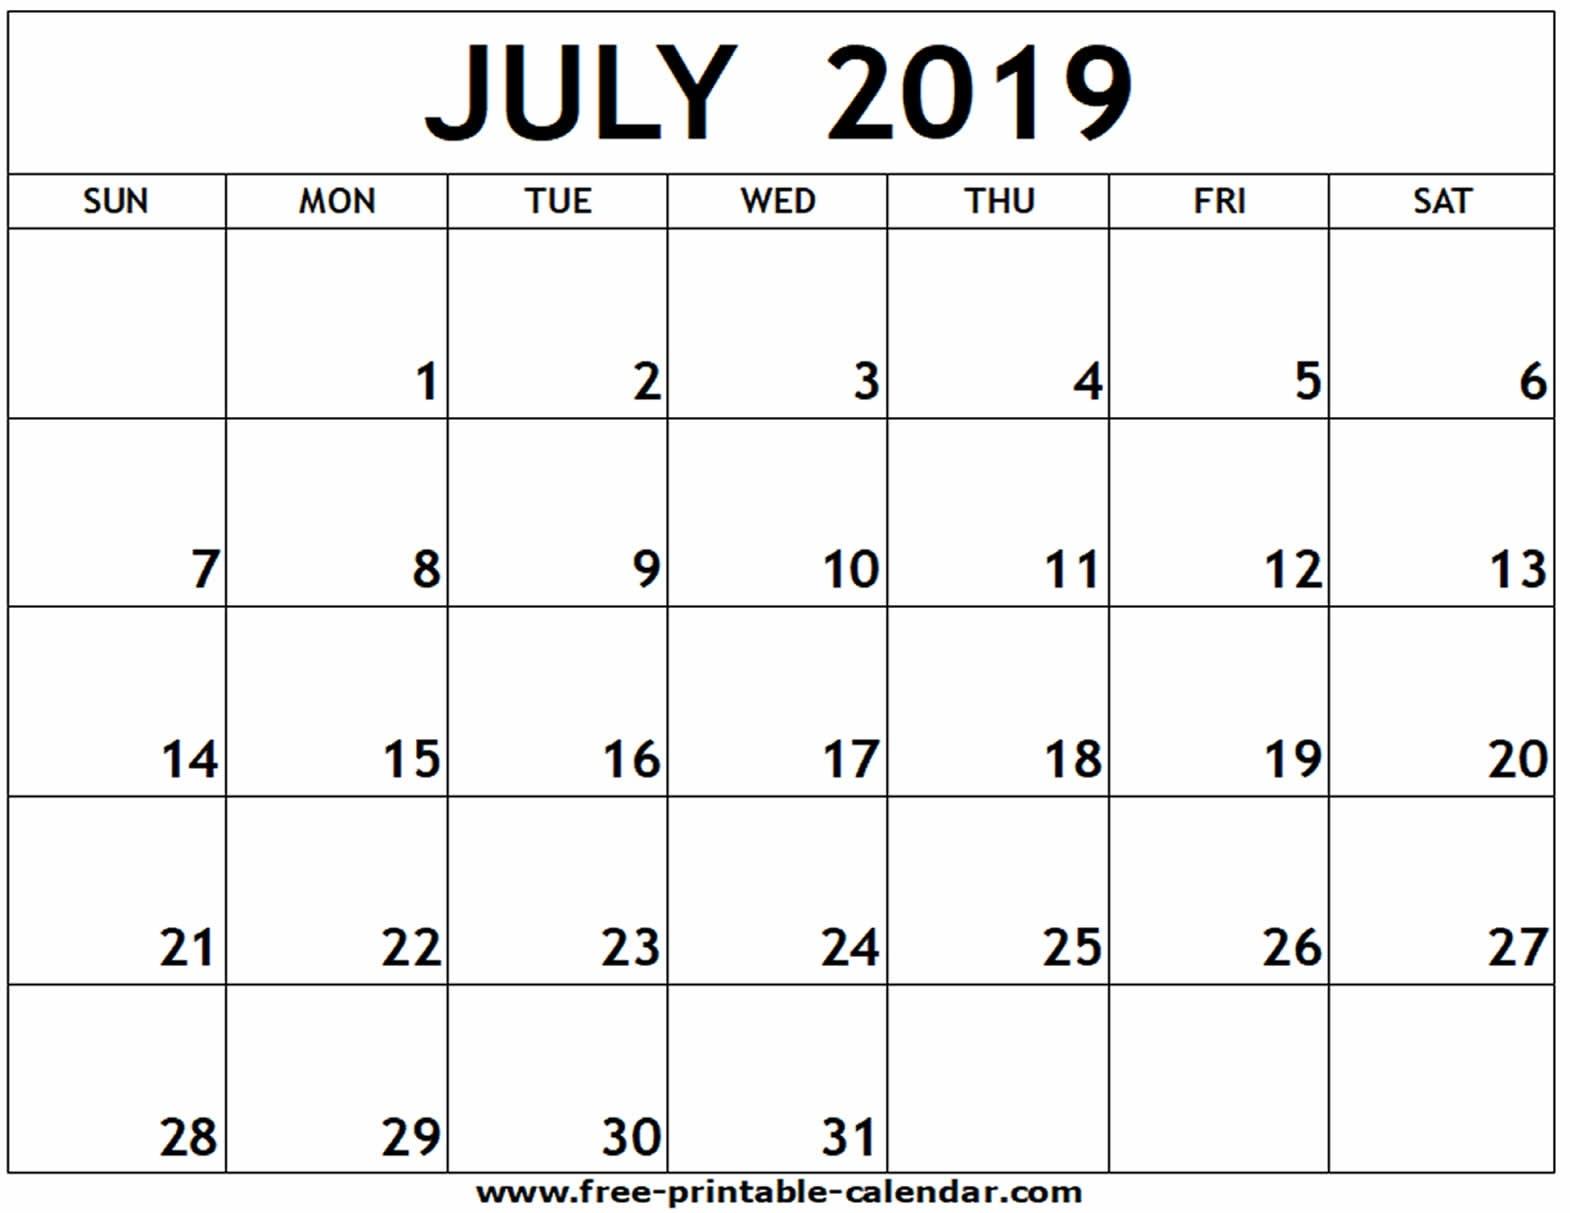 July 2019 Printable Calendar - Free-Printable-Calendar_Calendar For Printing 2019 Printable